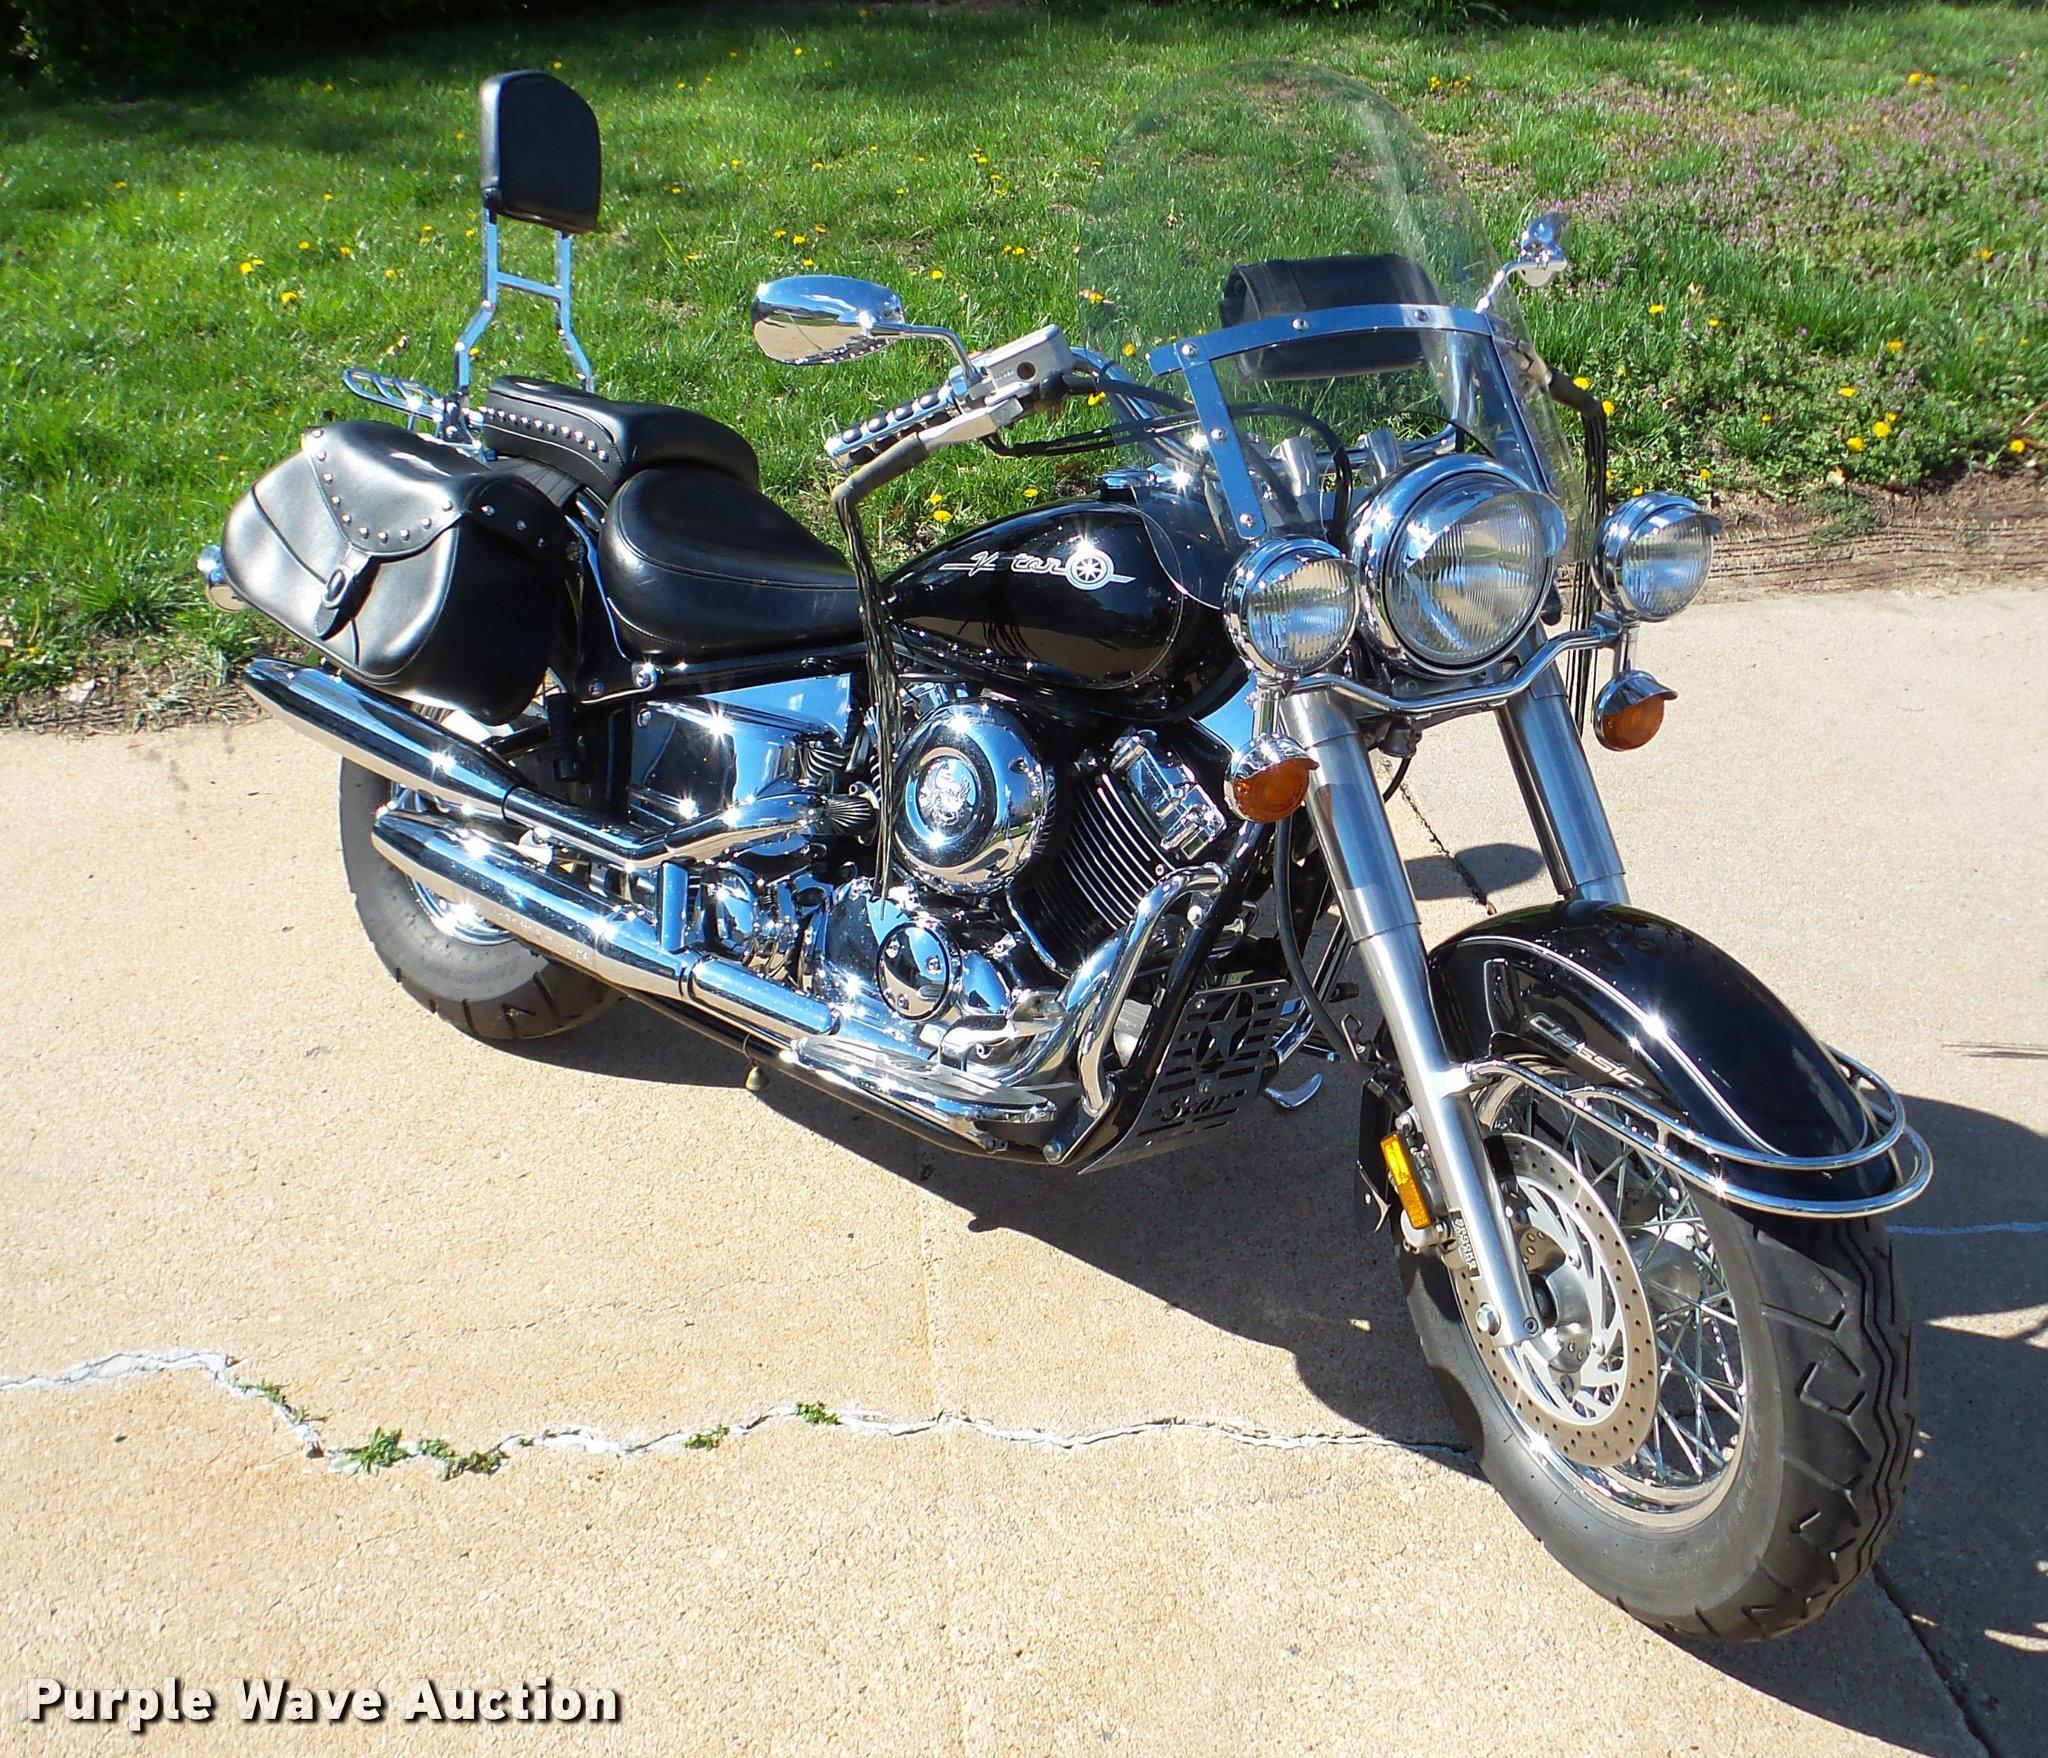 2000 Yamaha V Star 650 Classic motorcycle | Item DA1875 | SO